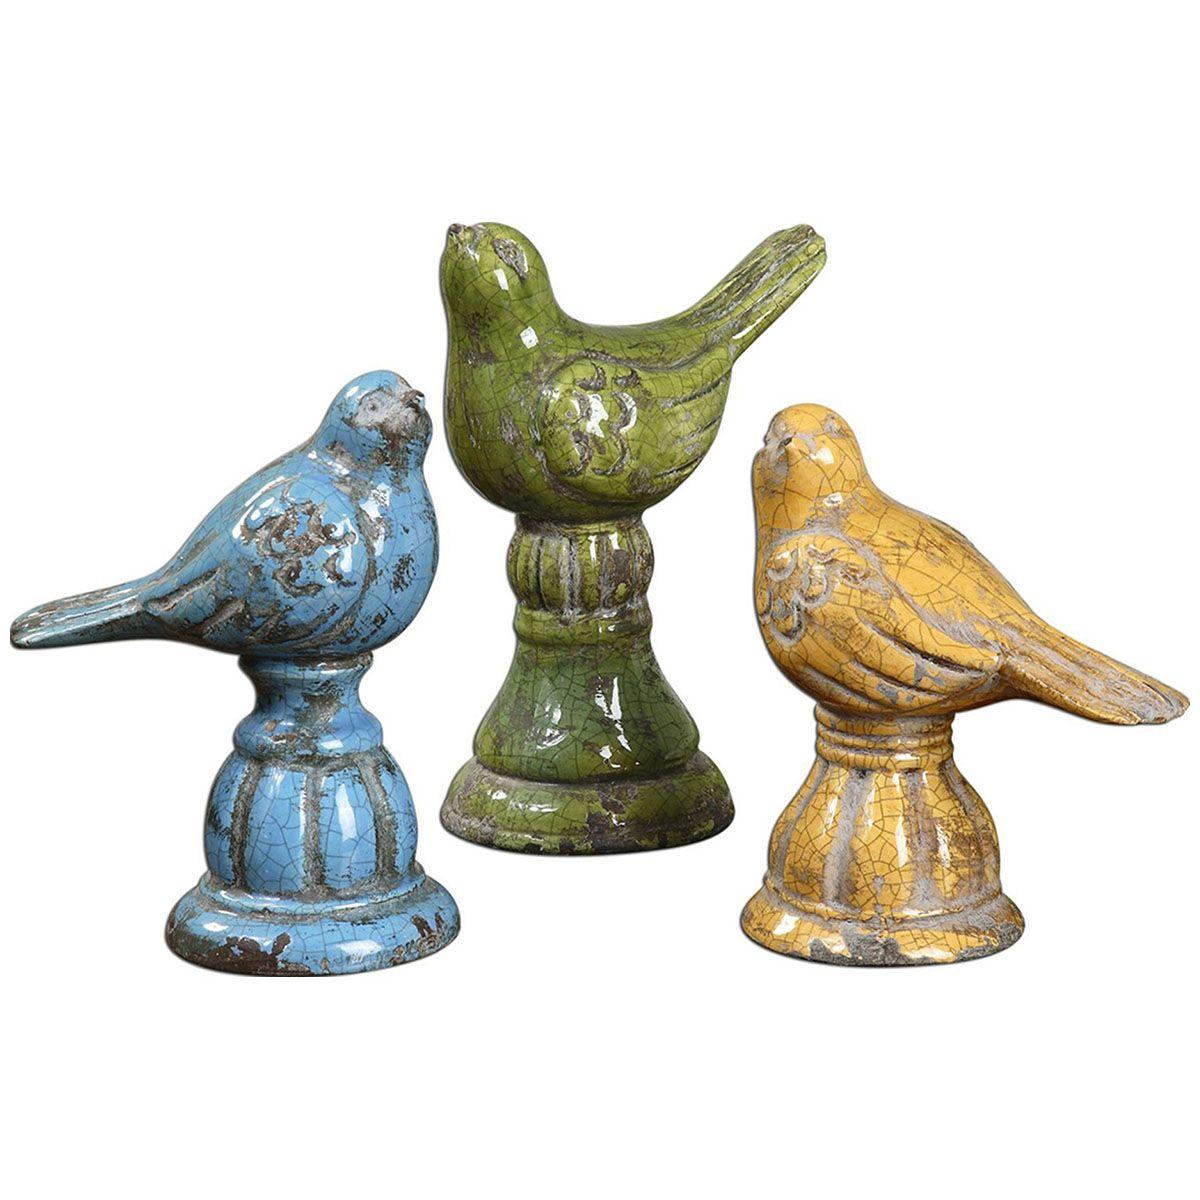 Uttermost Bird Trio Ceramic Figurines Set Of 3 19705 With Images Bird Decor Green Home Decor Ceramic Birds